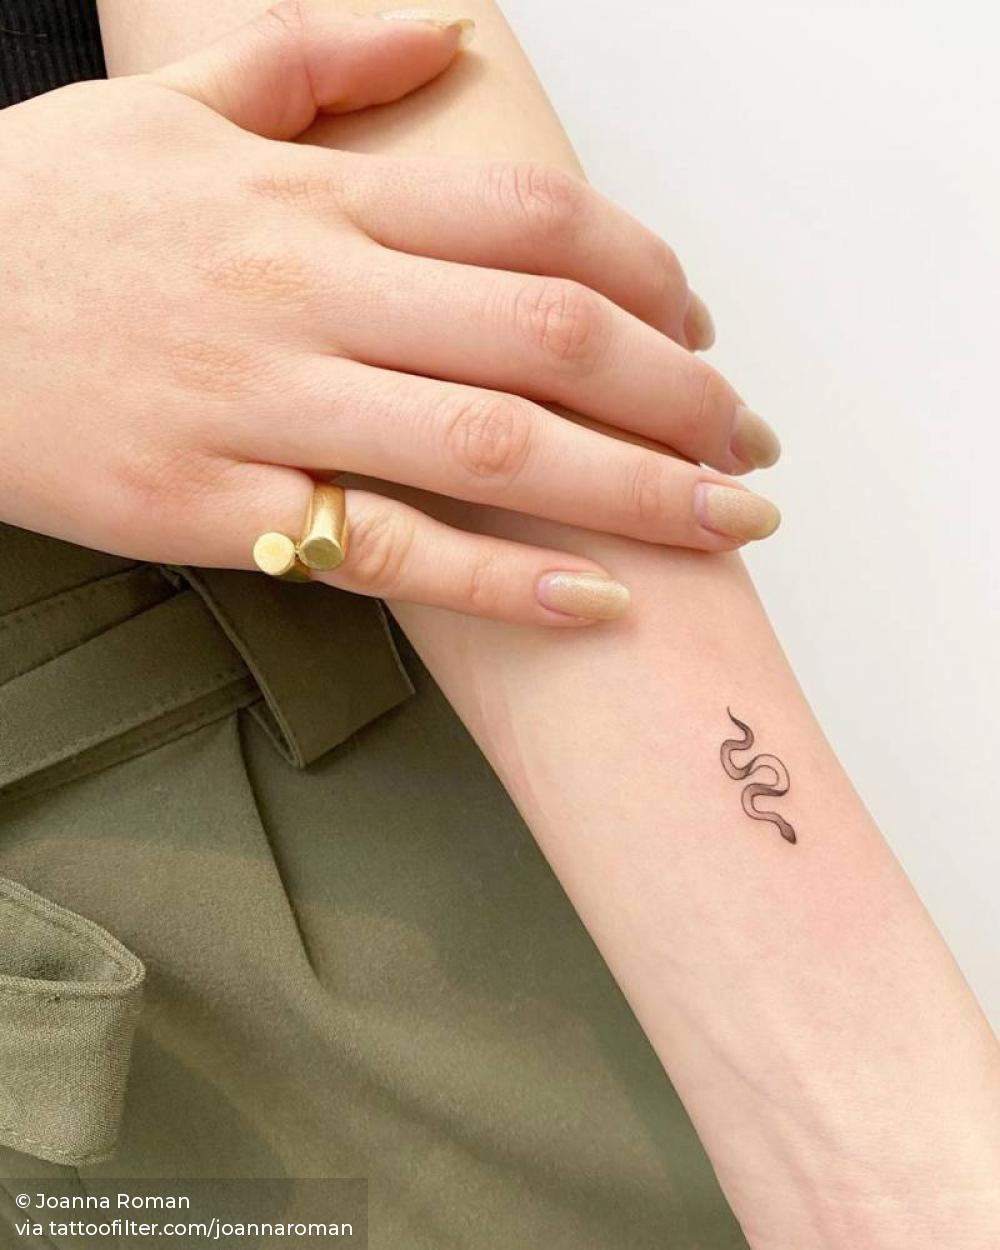 Small Tattoo Tumblr : small, tattoo, tumblr, Tattoos